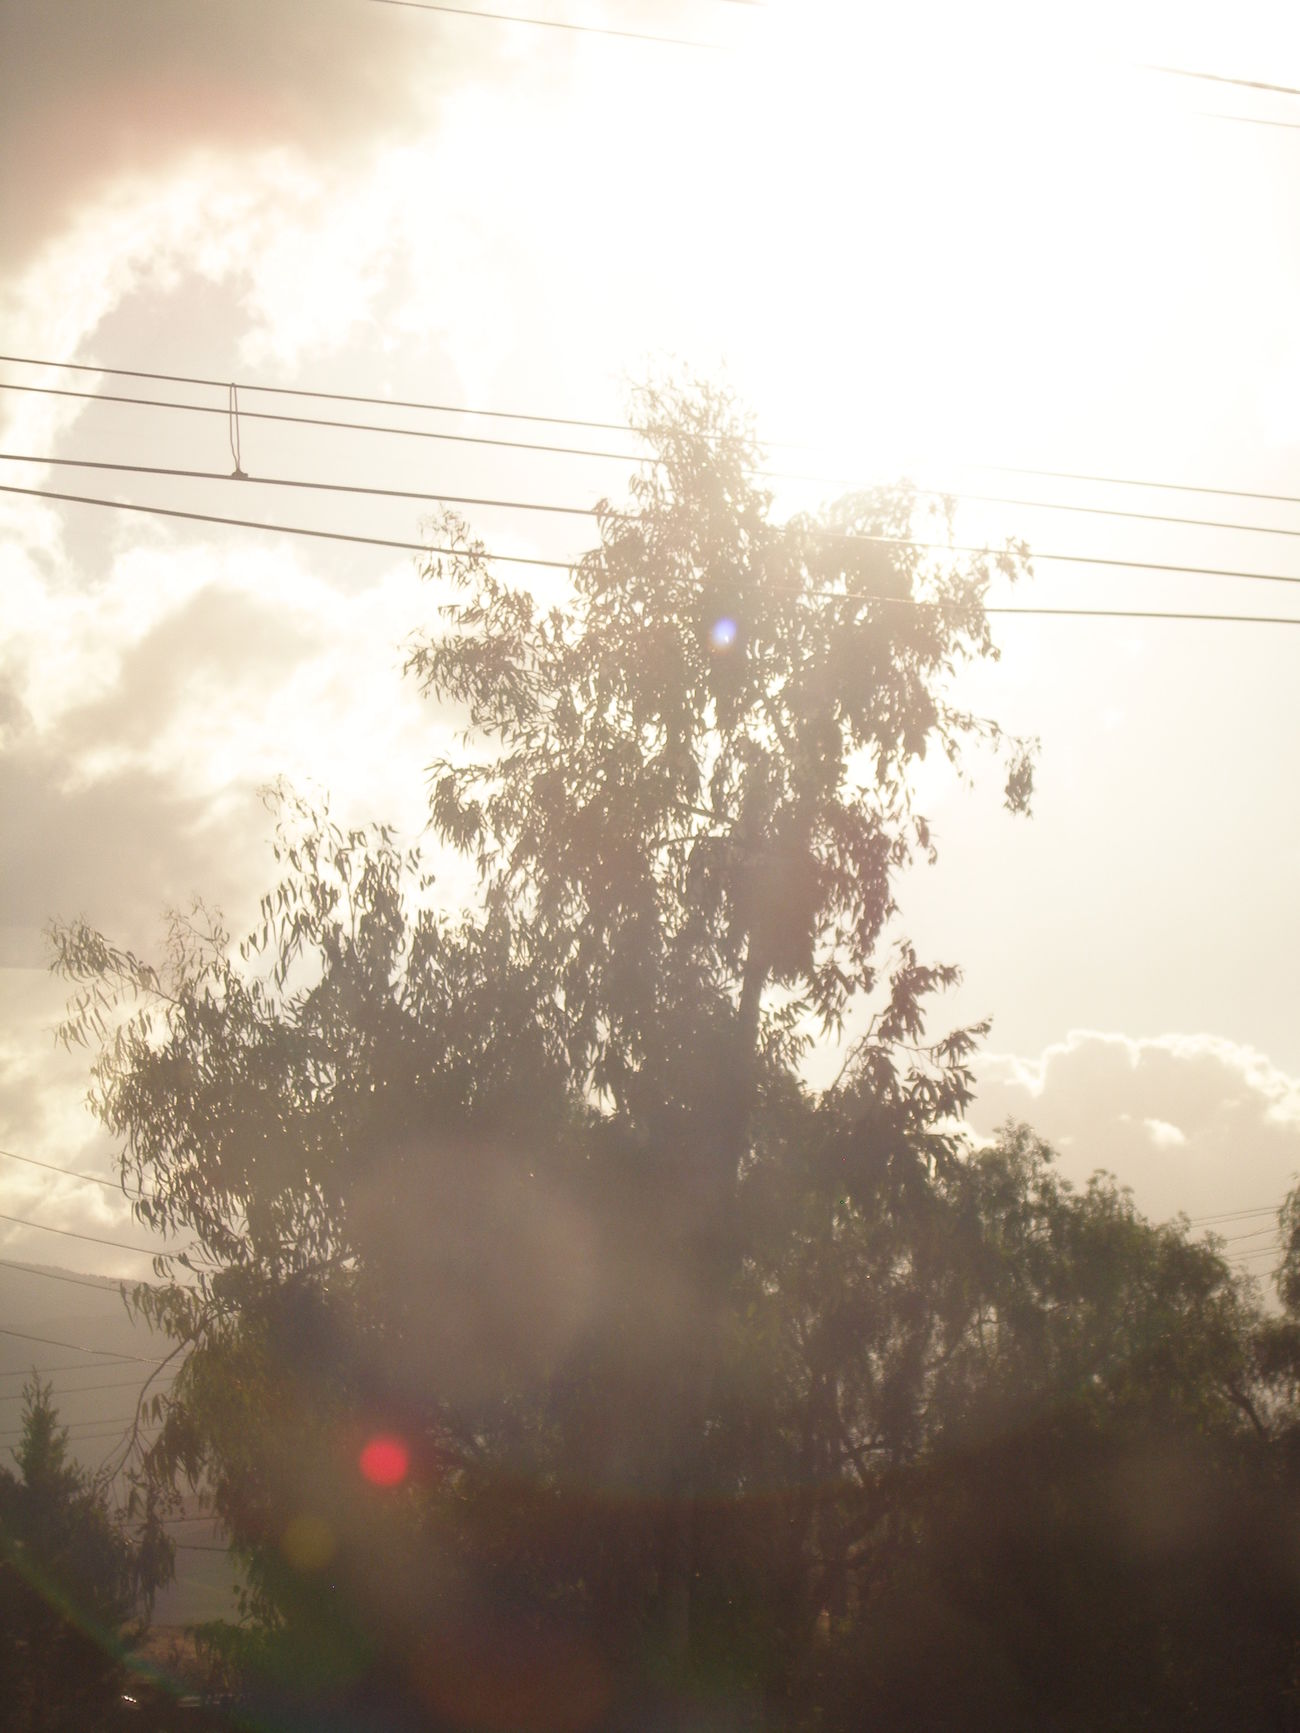 Suena 🎶🎧 Páginas tuyas. FabiánAntenas Lights Luces Light Luz Blanco White Tesis99 Window Ventanilla Ventana View Vistas Tren Train Travel Viajar árbol Tree Trayecto Route Destello Flare Blurred Transport